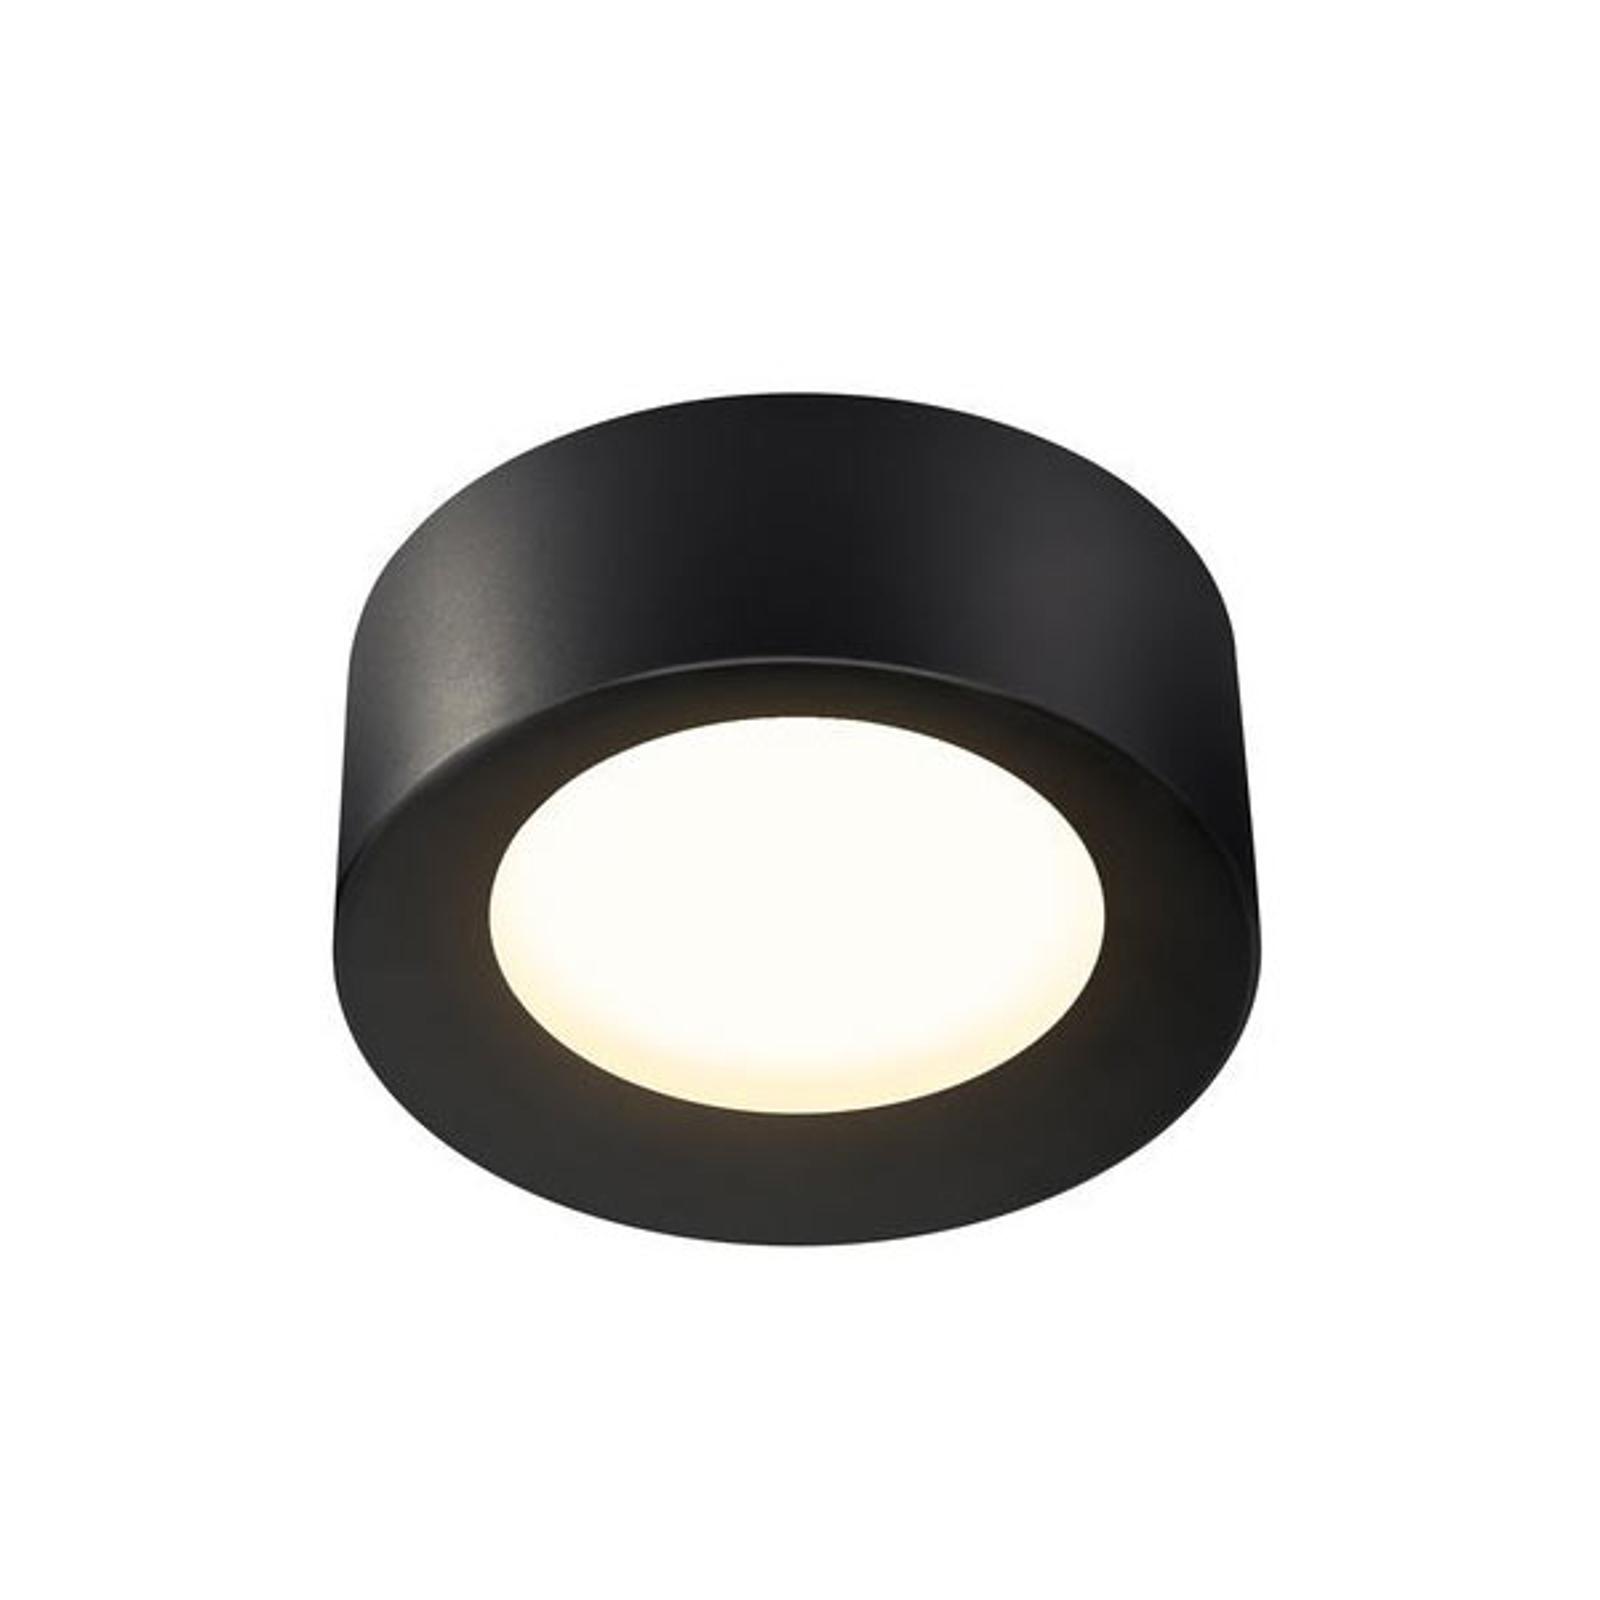 SLV Fera LED-taklampe, Ø 20 cm, matt svart